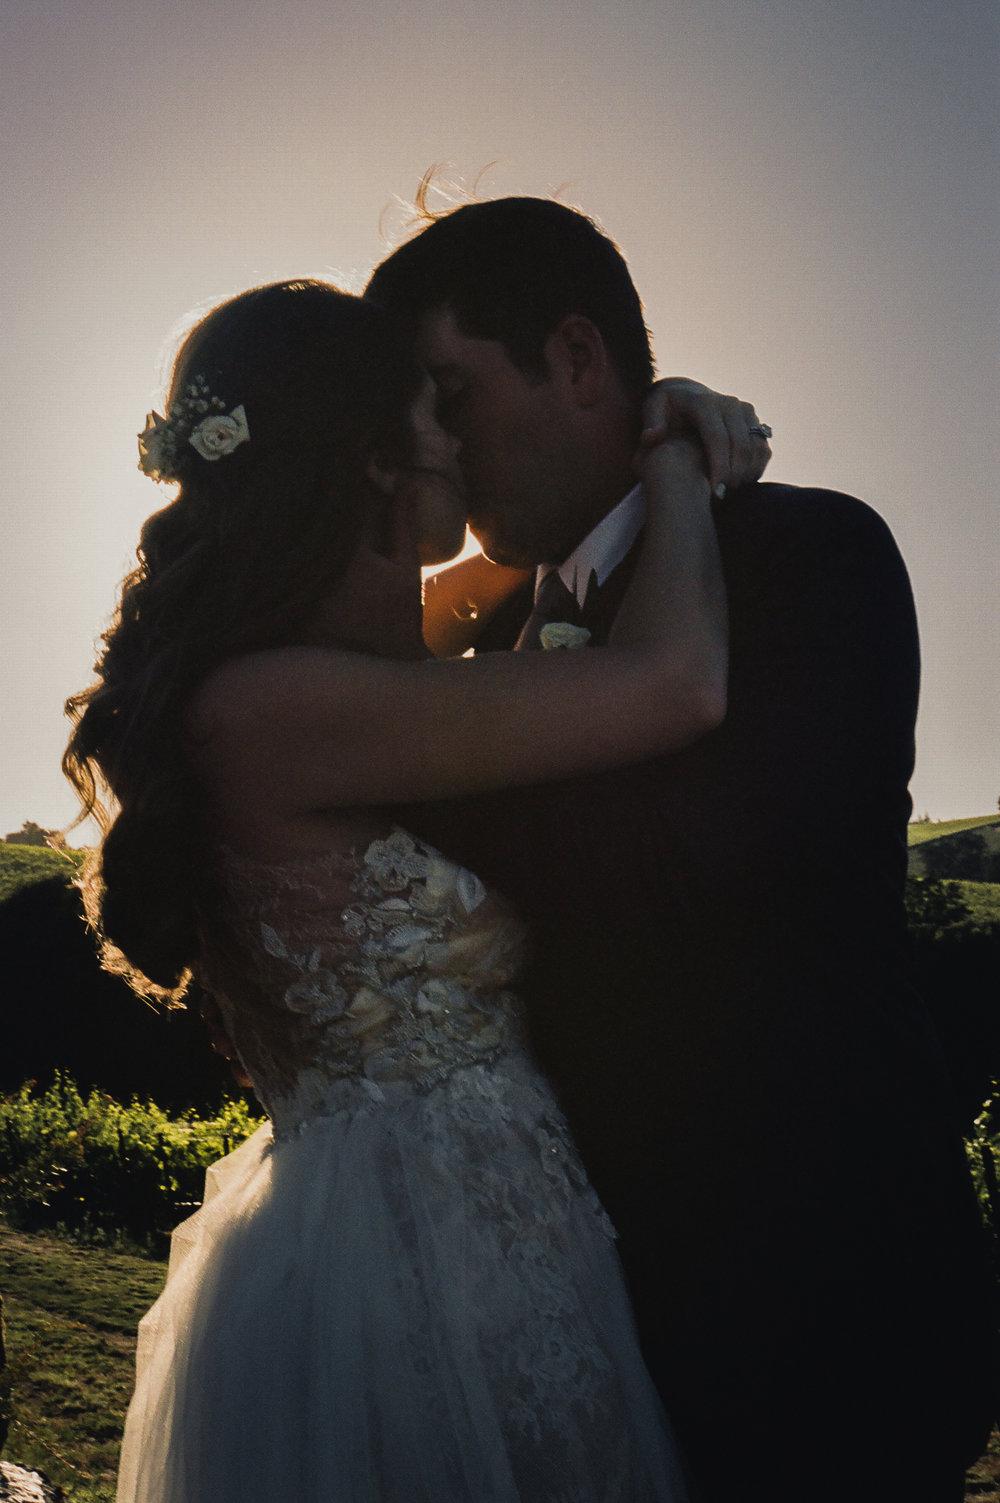 35mm-film-Michael-Megan-Wedding-Napa-2017-PRINT-025.jpg